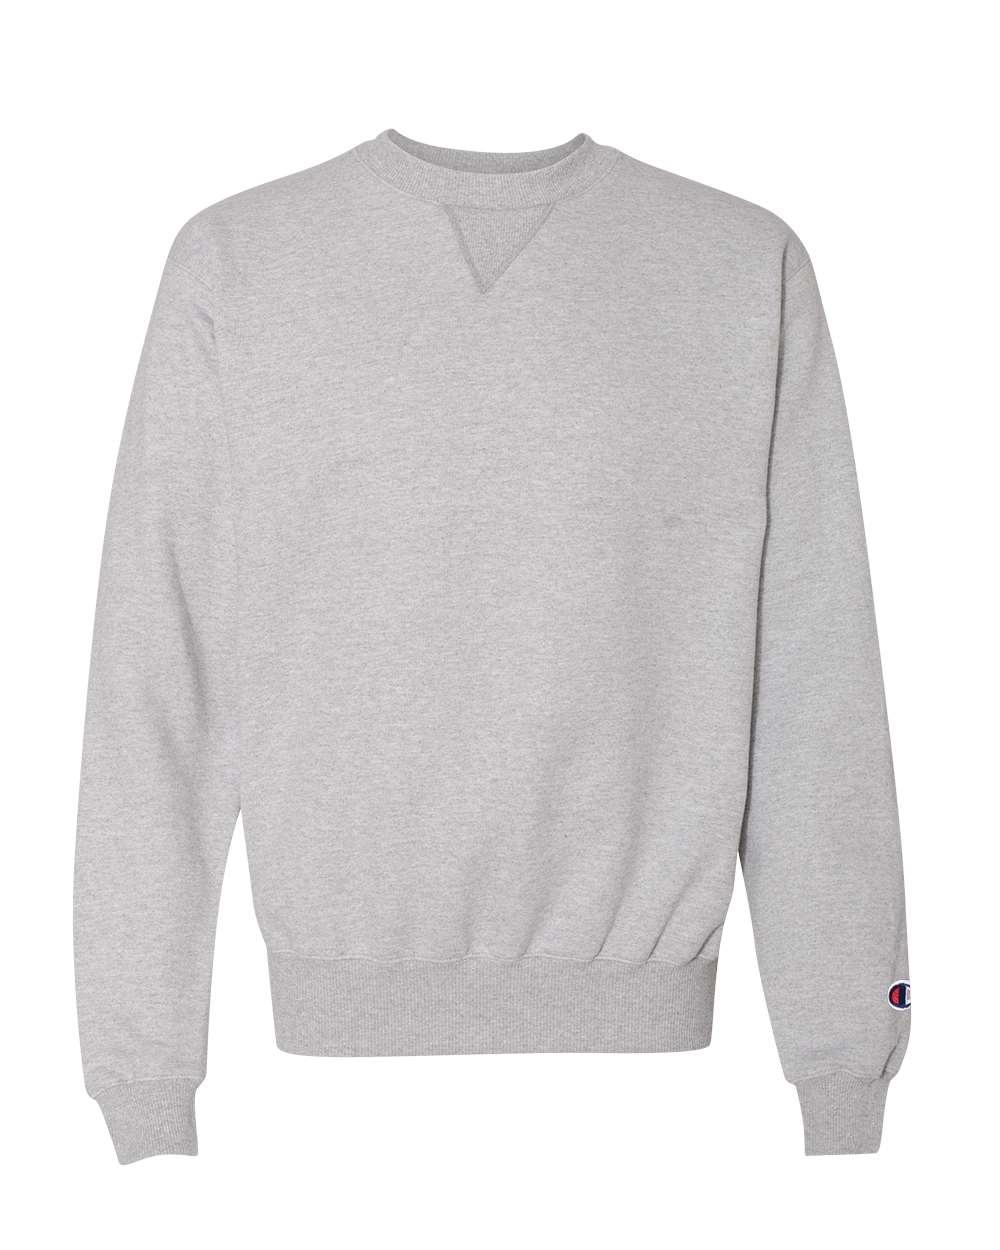 Champion-Mens-Cotton-Max-Crewneck-Sweatshirt-Pullover-S178-up-to-3XL miniature 9